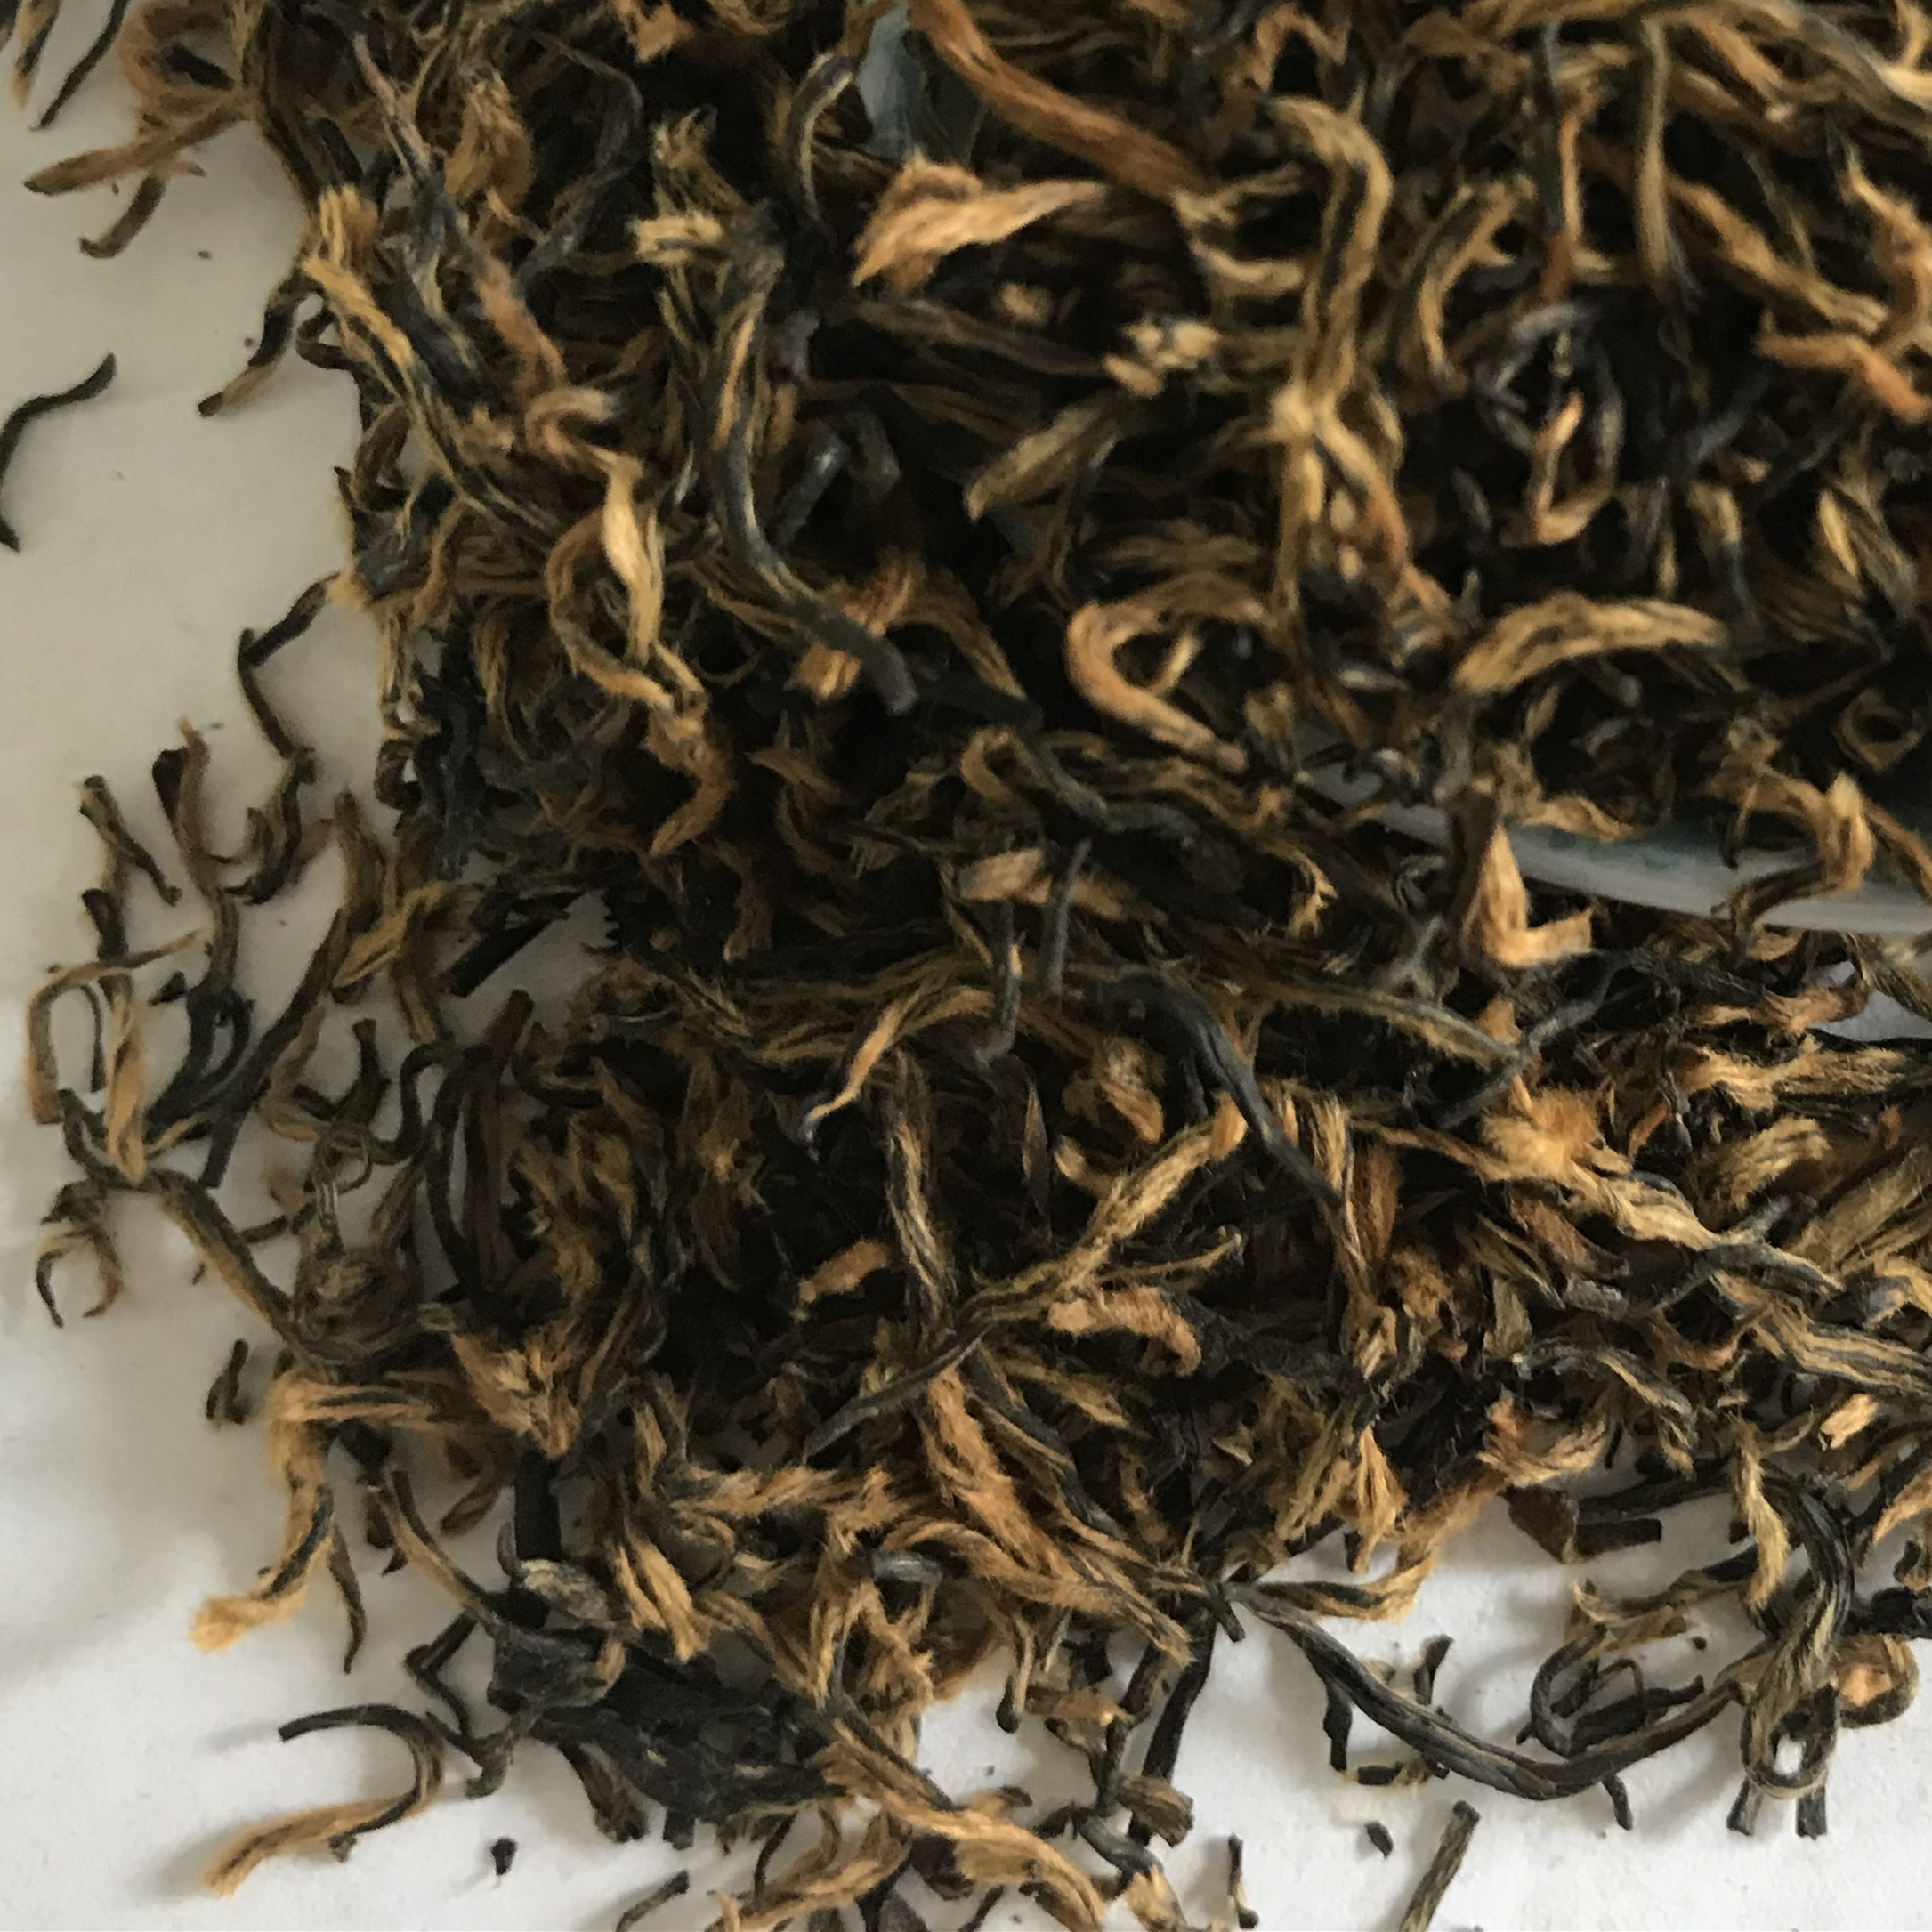 High Moutain Wuyi Jin Jun Mei Black Tea High Quality Pekoe Jinjunmei Loose Leaf Black Tea Organic Fujian Black Tea Jin Jun Mei - 4uTea | 4uTea.com